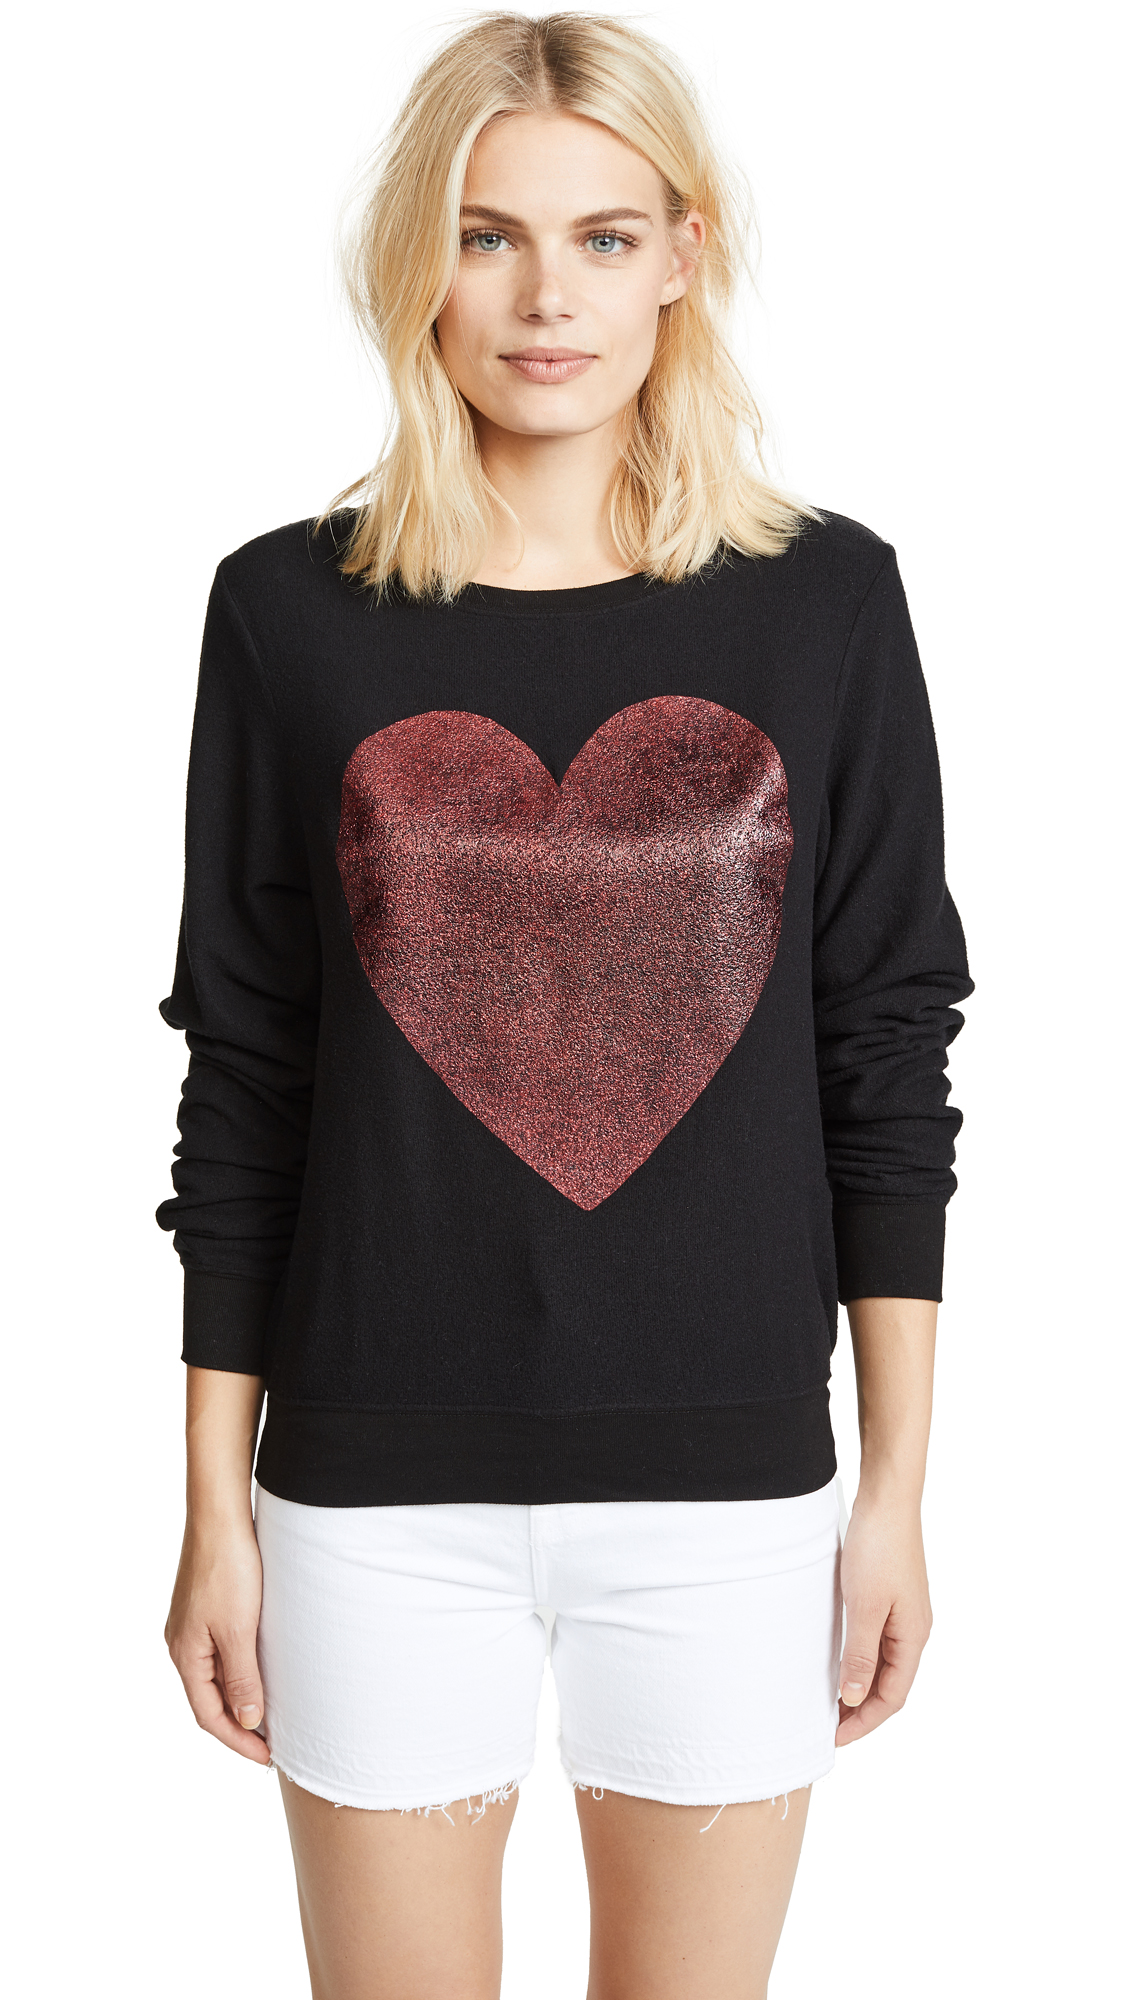 Wildfox Sparkle Heart Baggy Beach Pullover - Jet Black